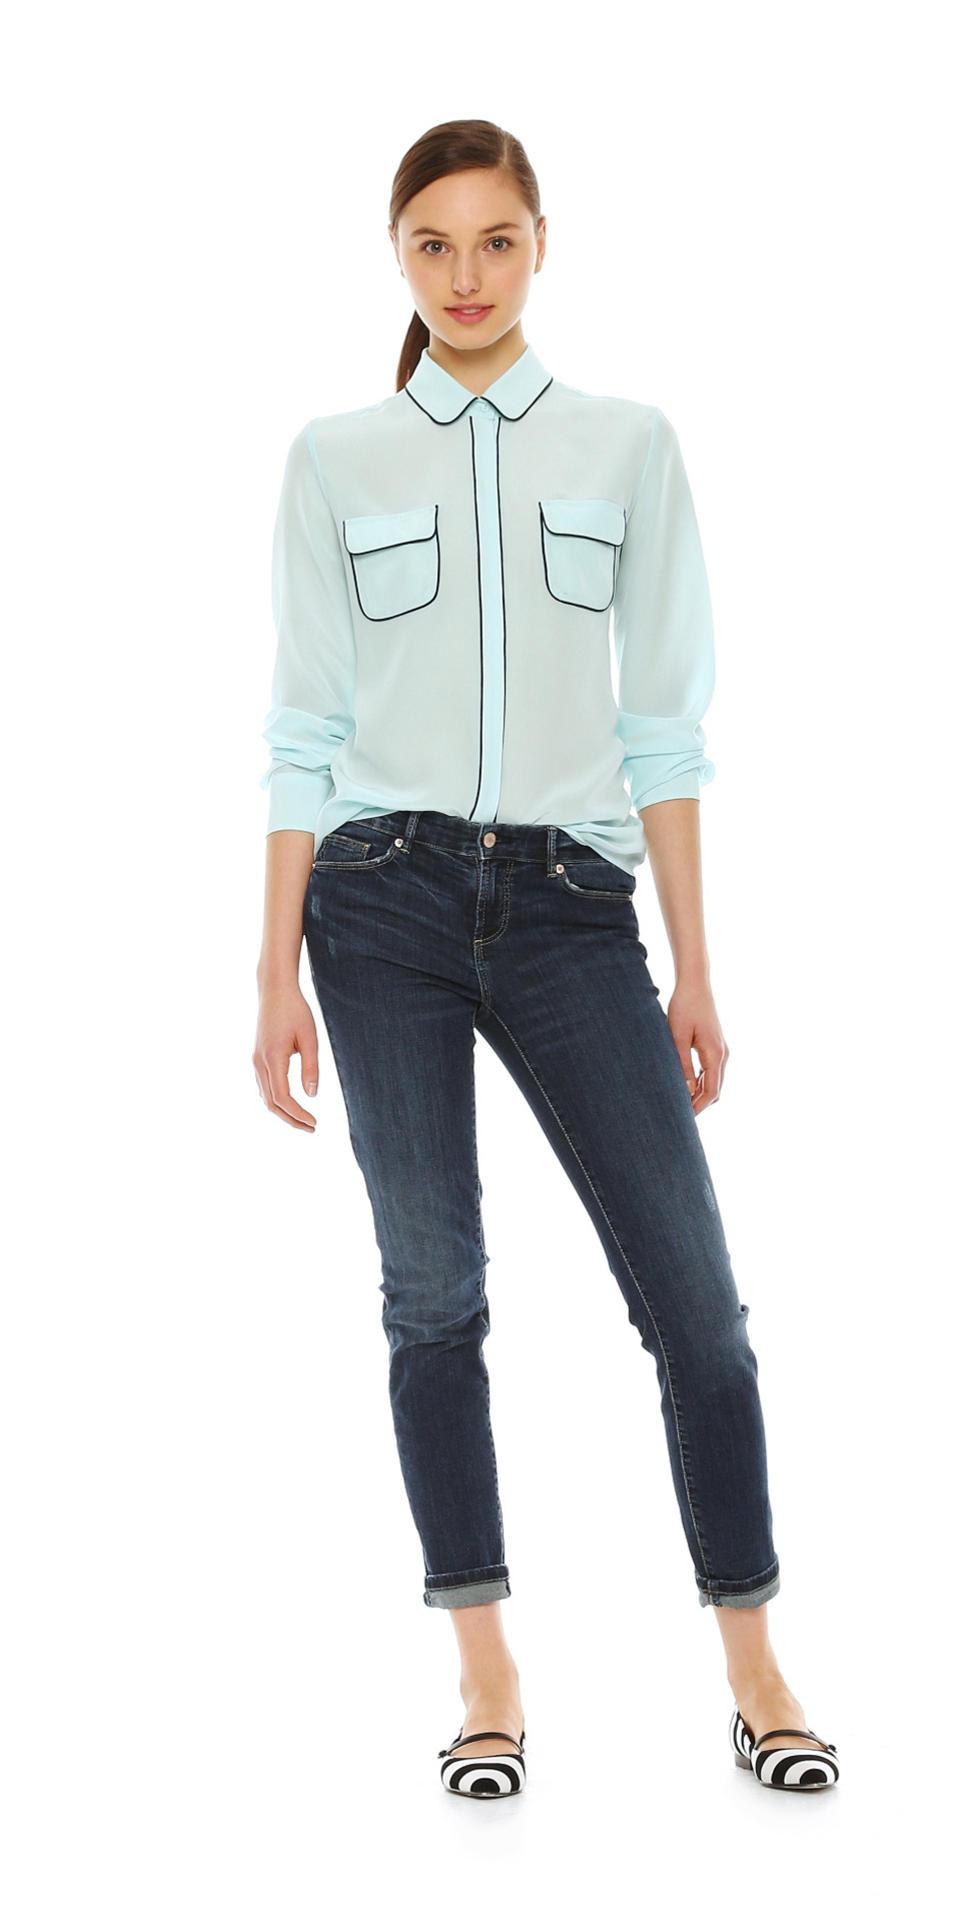 Joe Fresh Piped Silk Shirt in Aqua ($49)